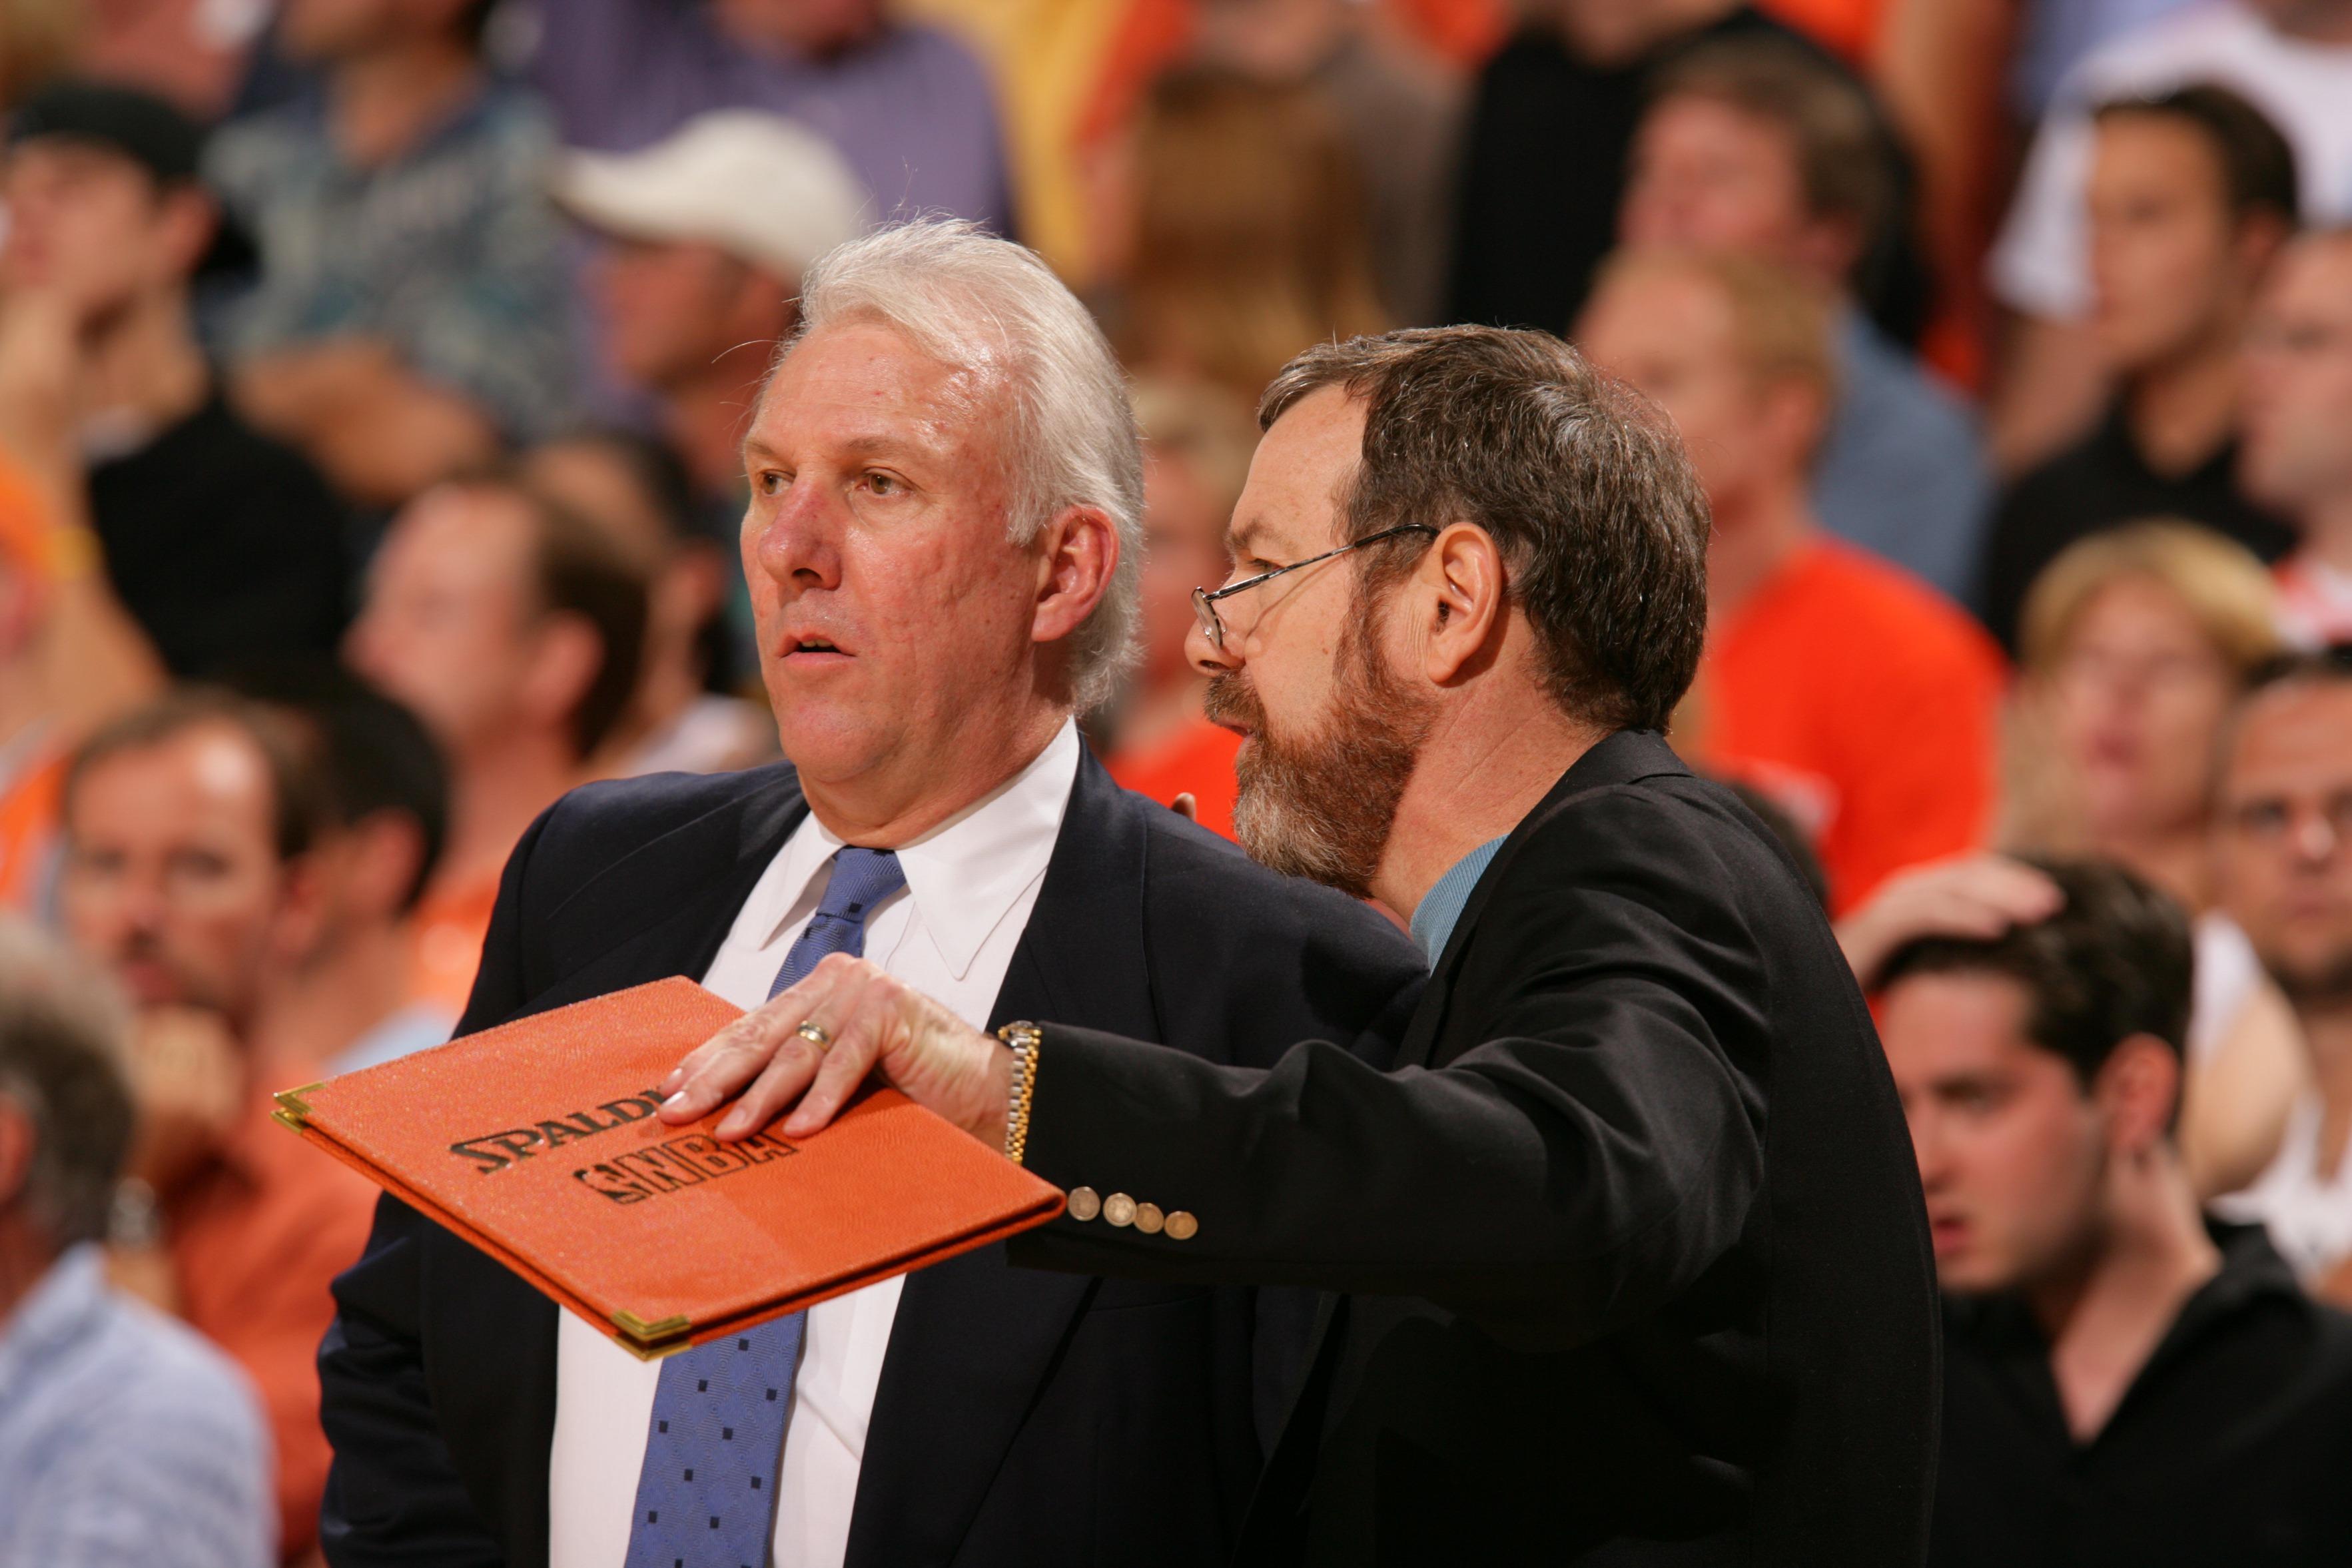 San Antonio Spurs Coach Gregg Popovich and Assistant Coach P.J. Carlesimo, 2005 NBA Playoffs